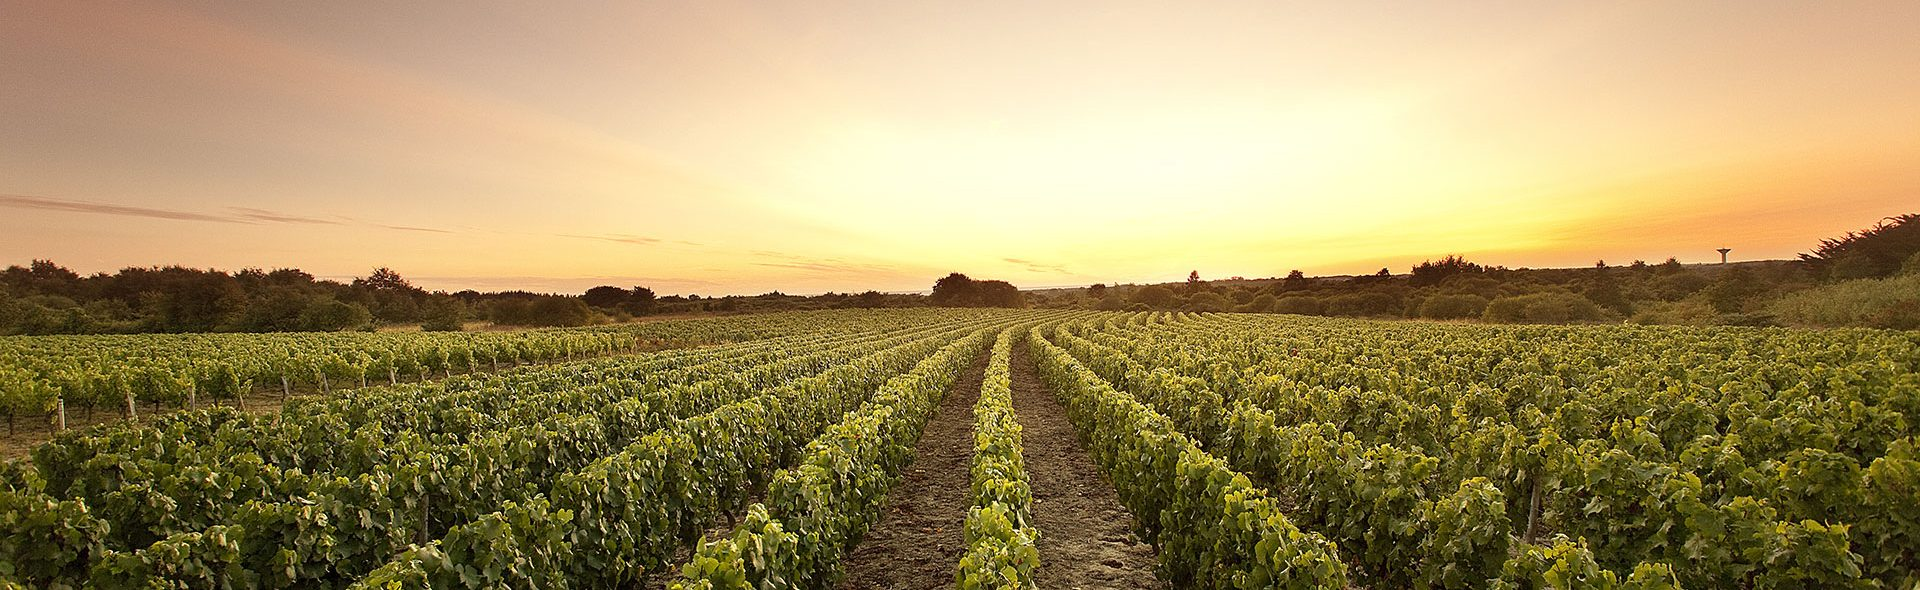 Camping Club Mahana : Vignobles Des Fiefs Vendéens Brem Sur Mer A